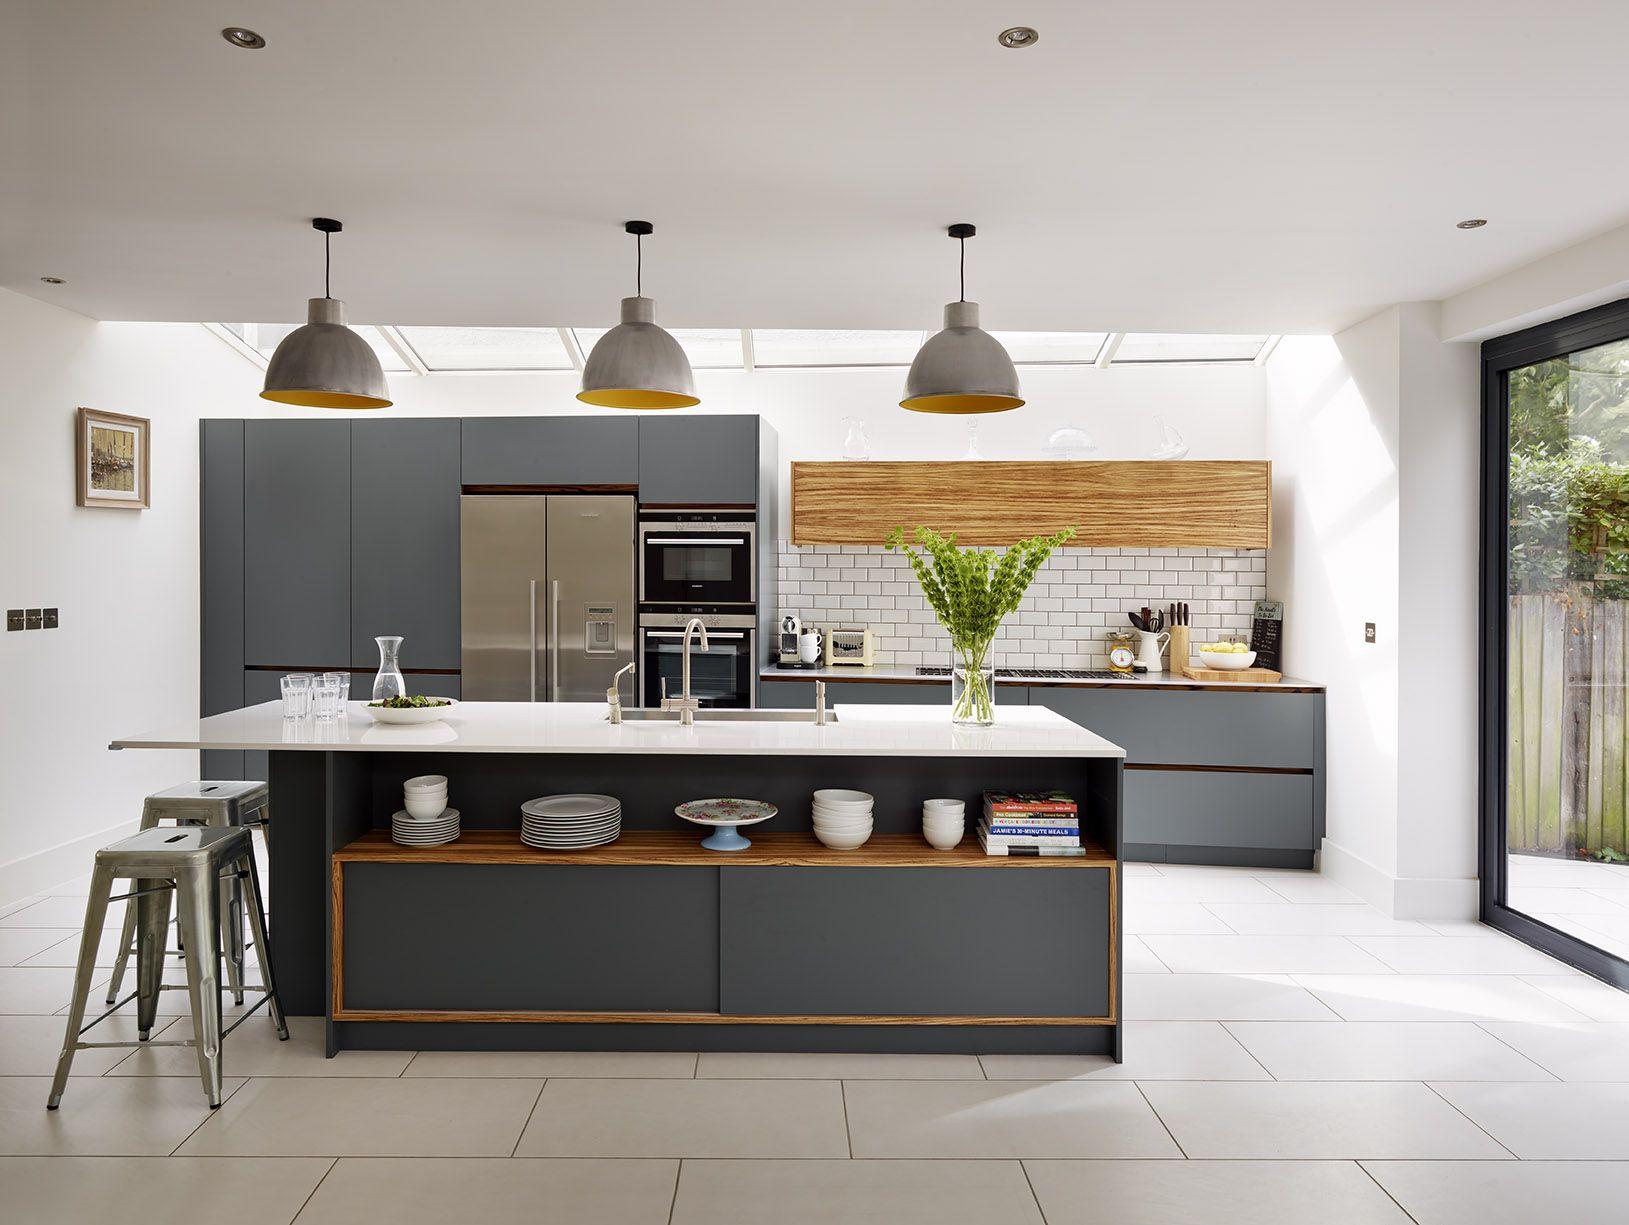 Explore Urban Kitchen, Kitchen Living, And More!